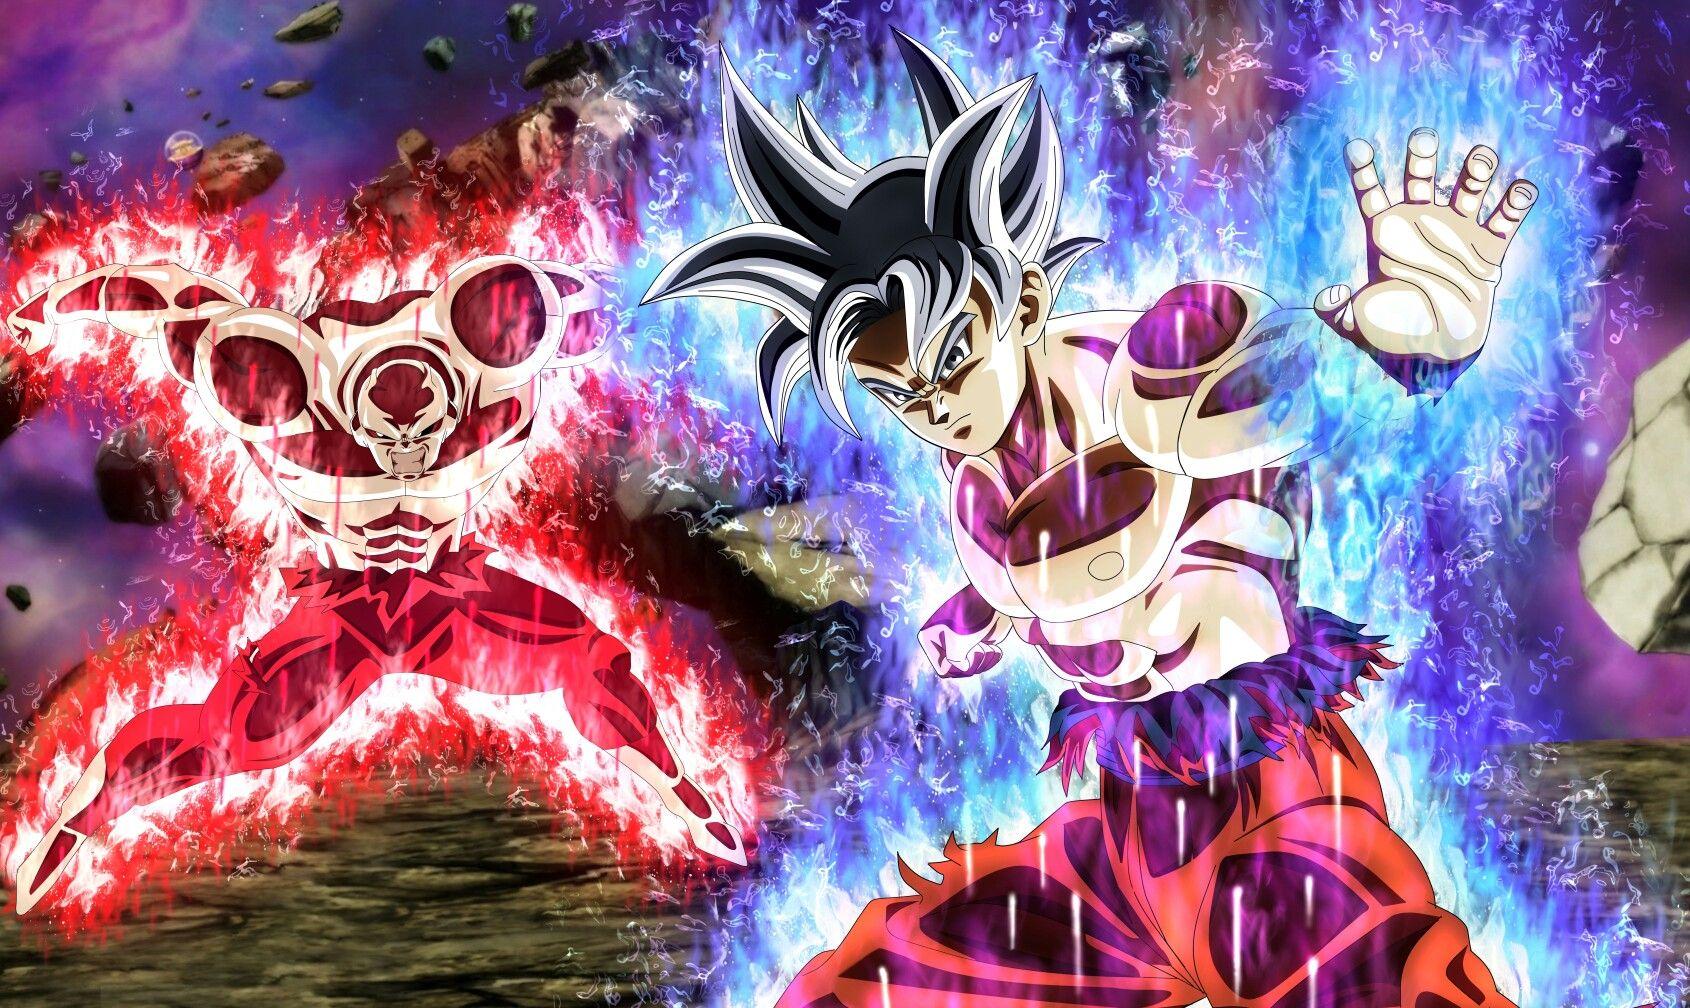 Goku And Jiren Final Showdown Goku Vs Jiren Dragon Ball Goku Vs